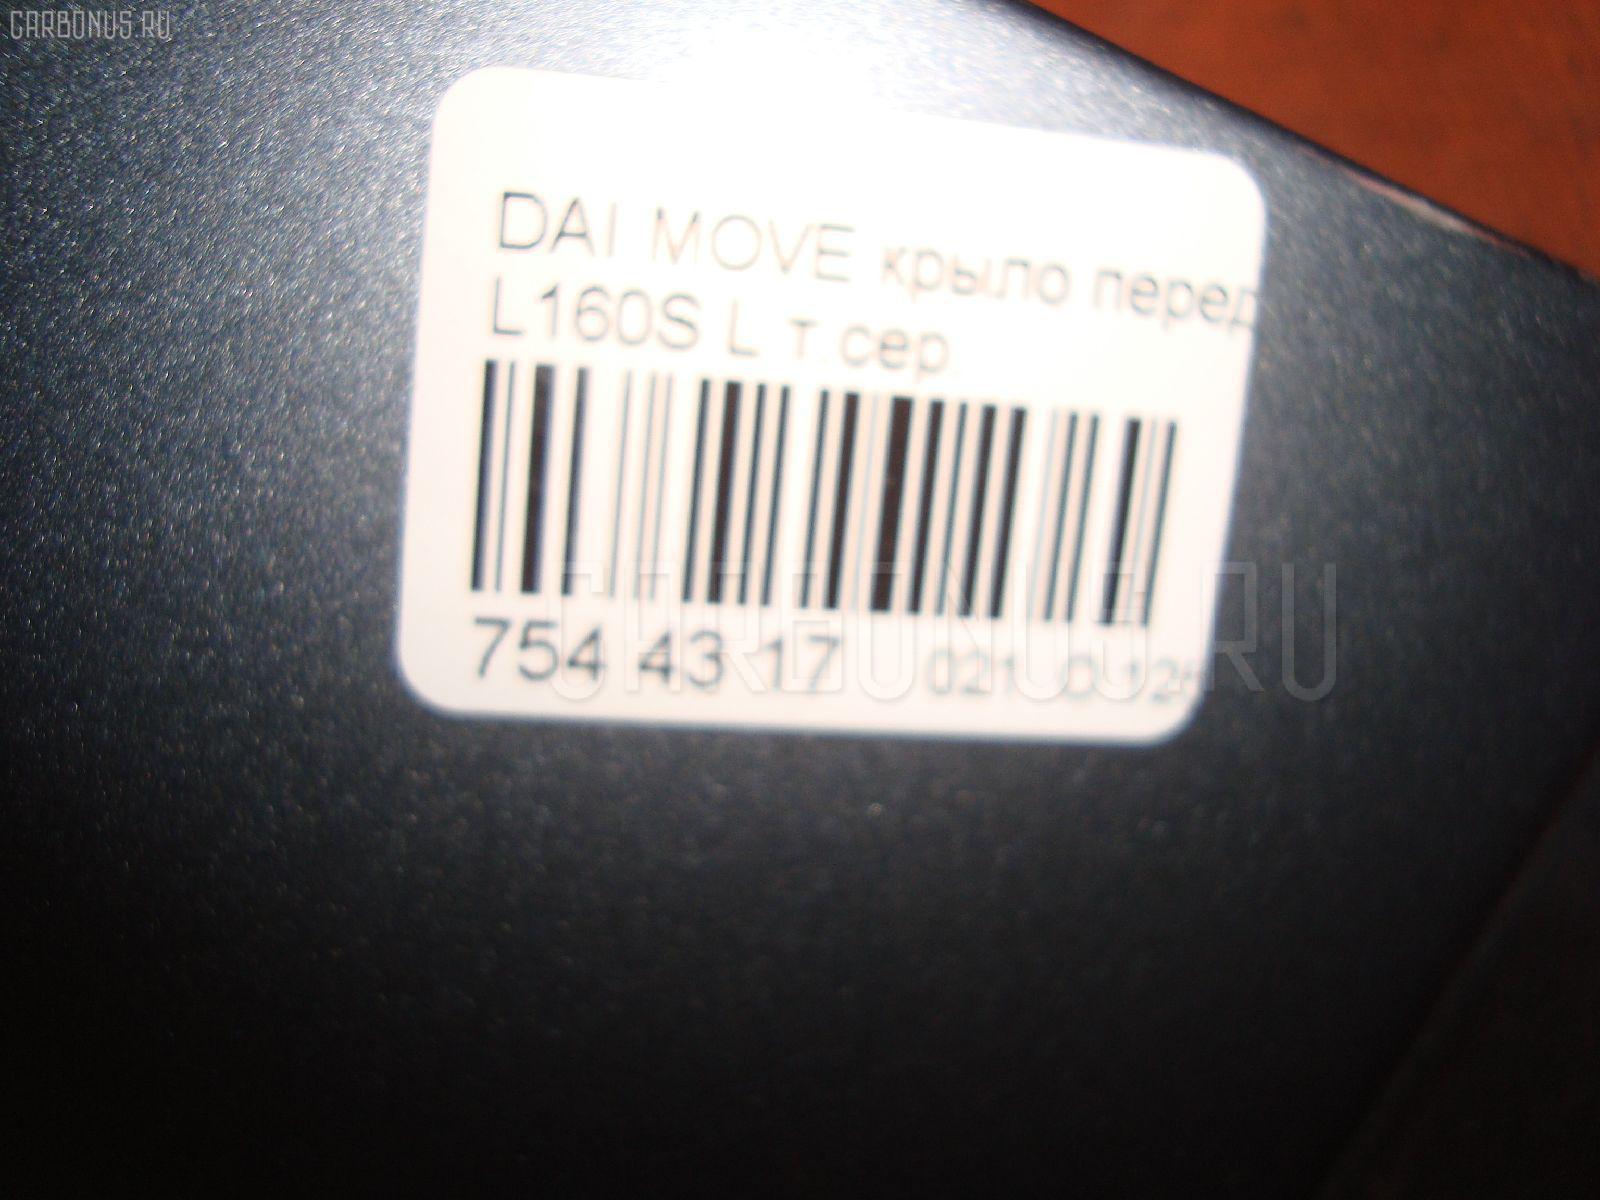 Крыло переднее DAIHATSU MOVE L160S Фото 2